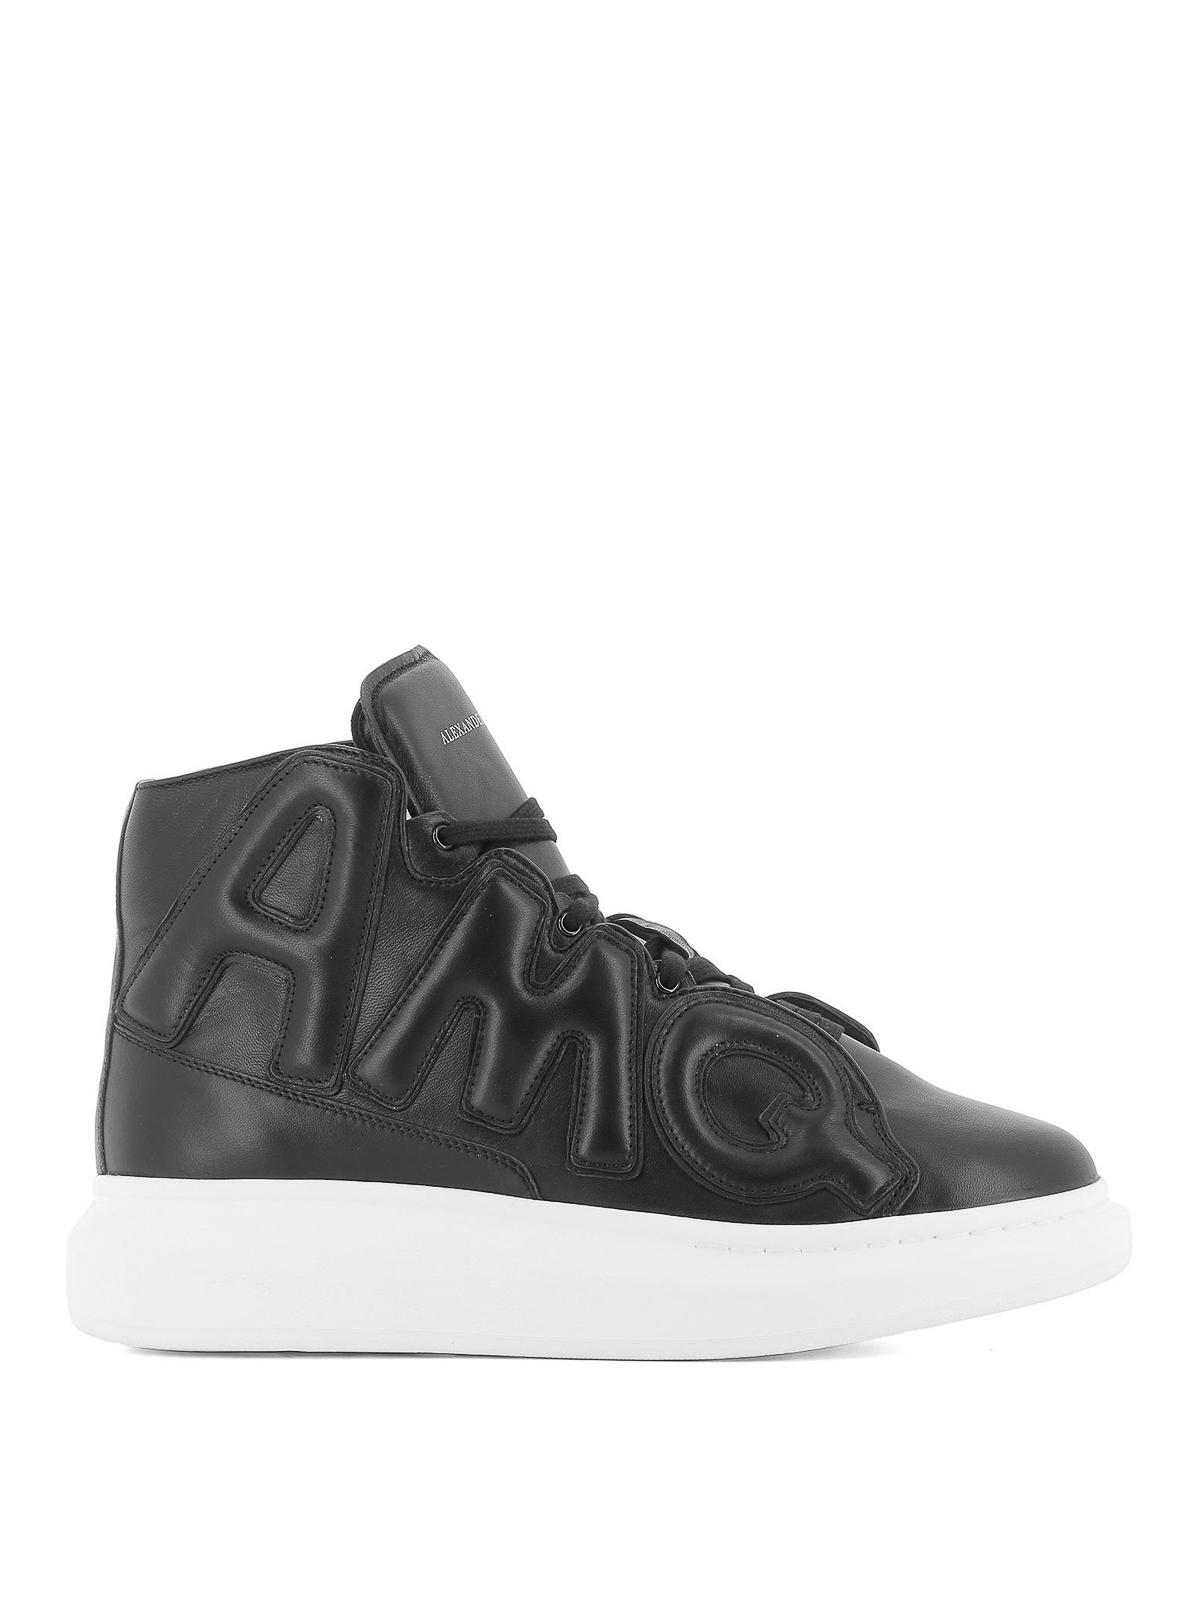 Alexander Mcqueen - Sneaker Oversize AMQ alte in nappa nera ...